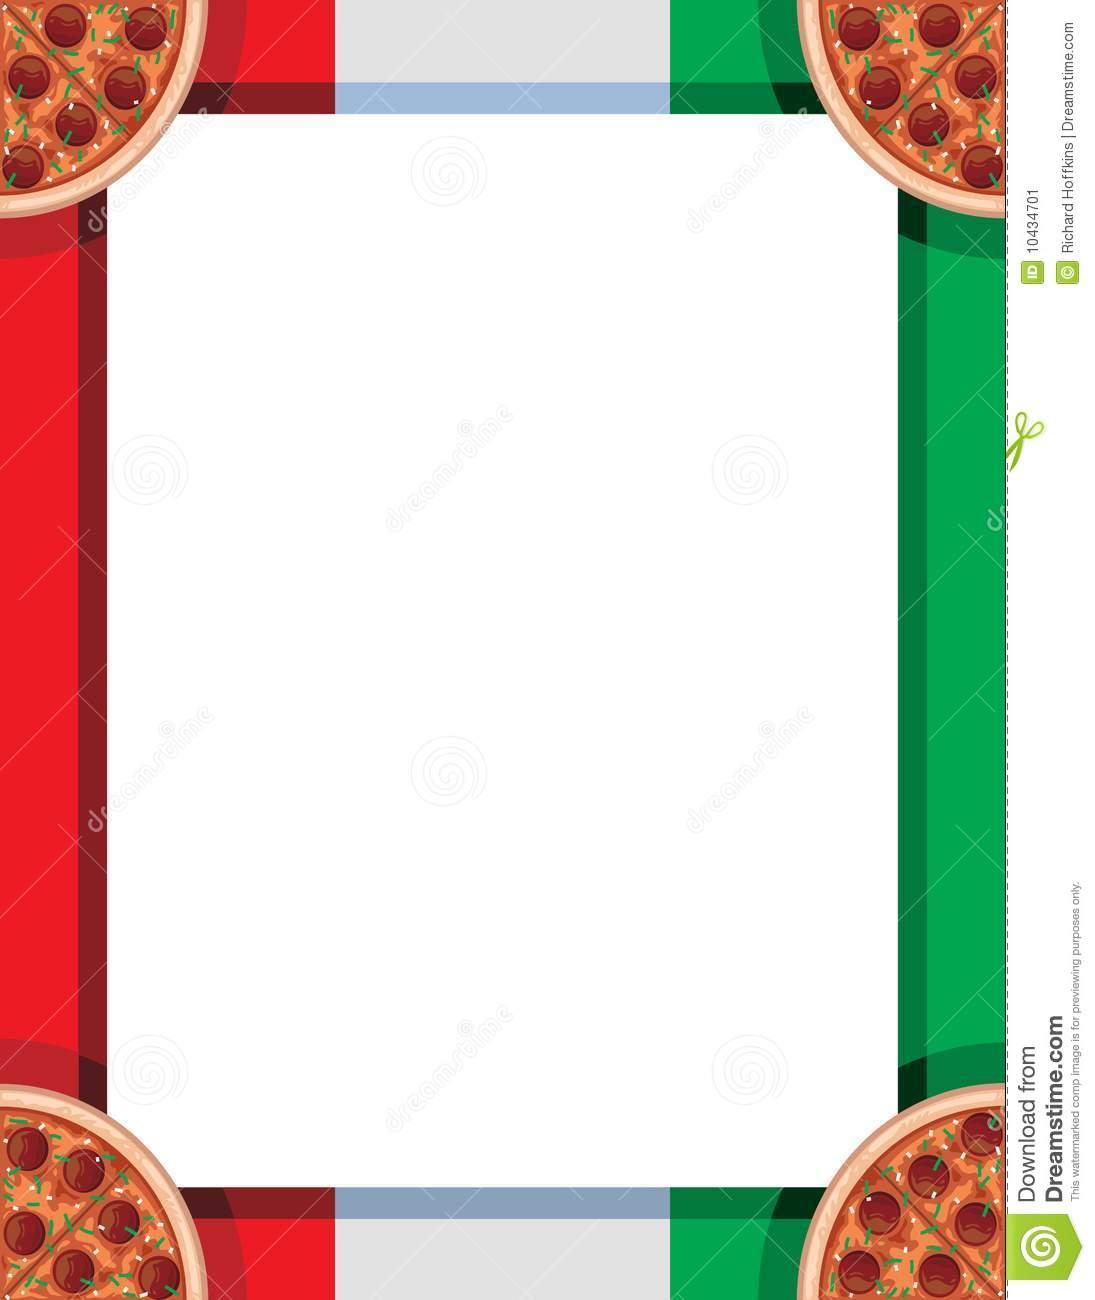 Pizza border clipart 4 » Clipart Station.